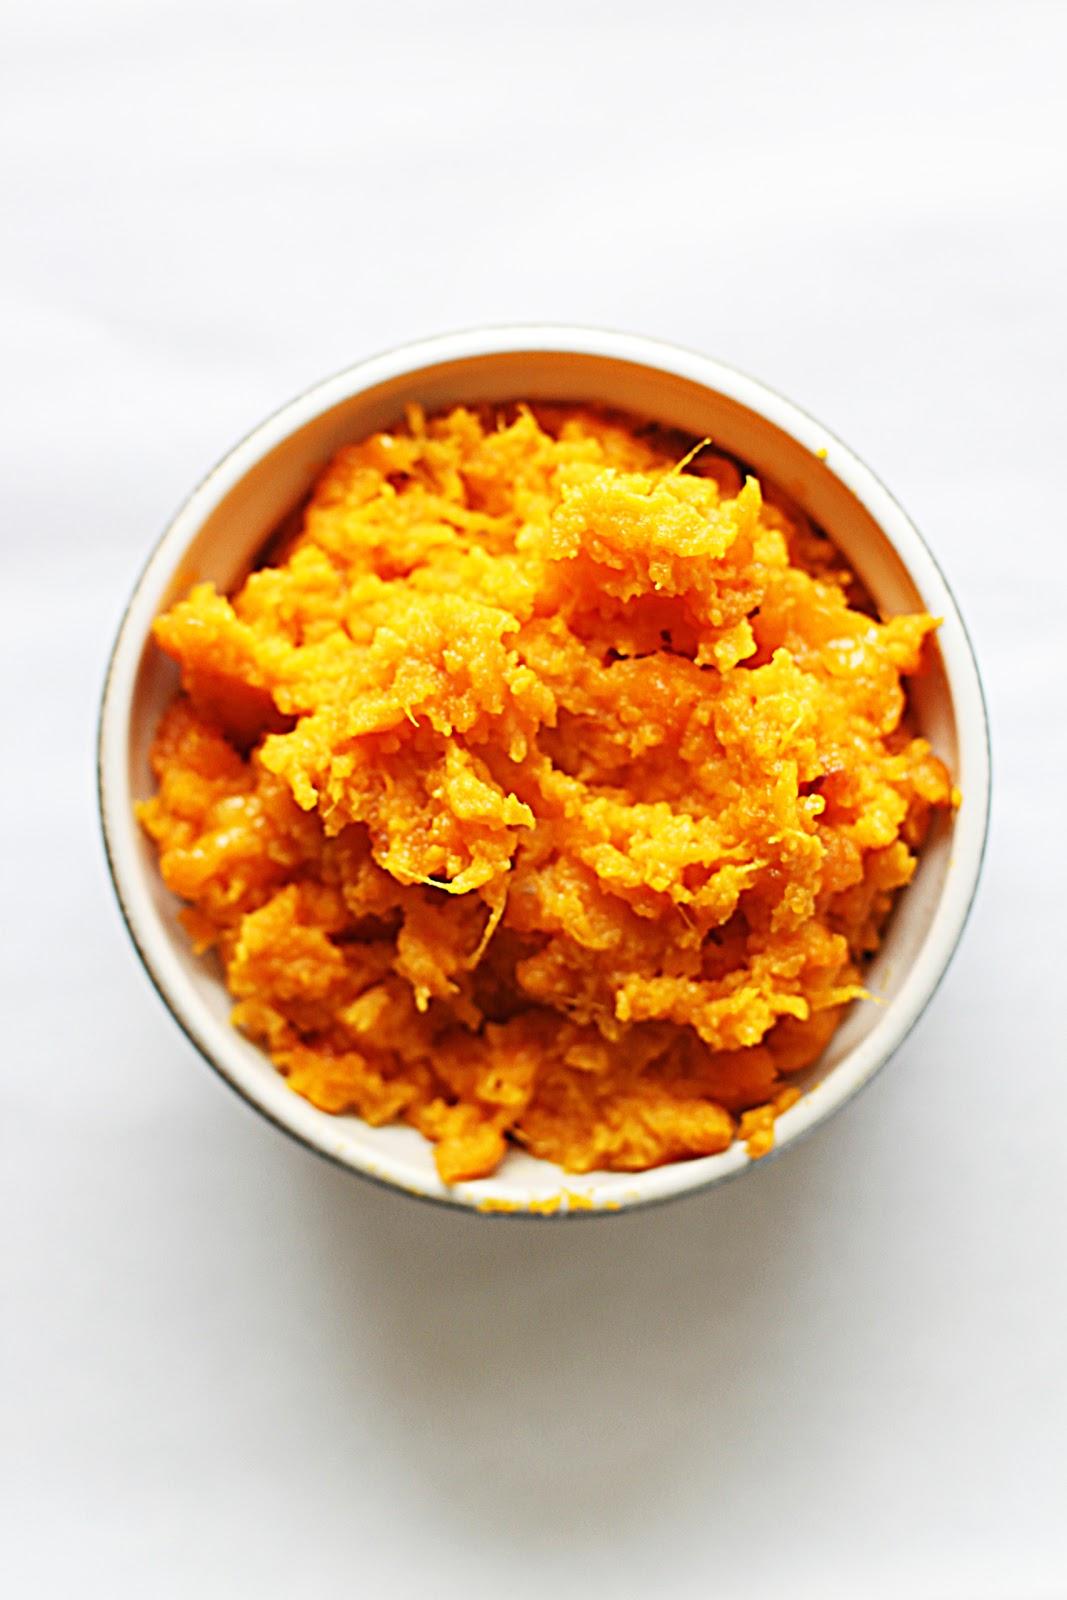 Sugar Break: Nando's sweet potato mash recipe